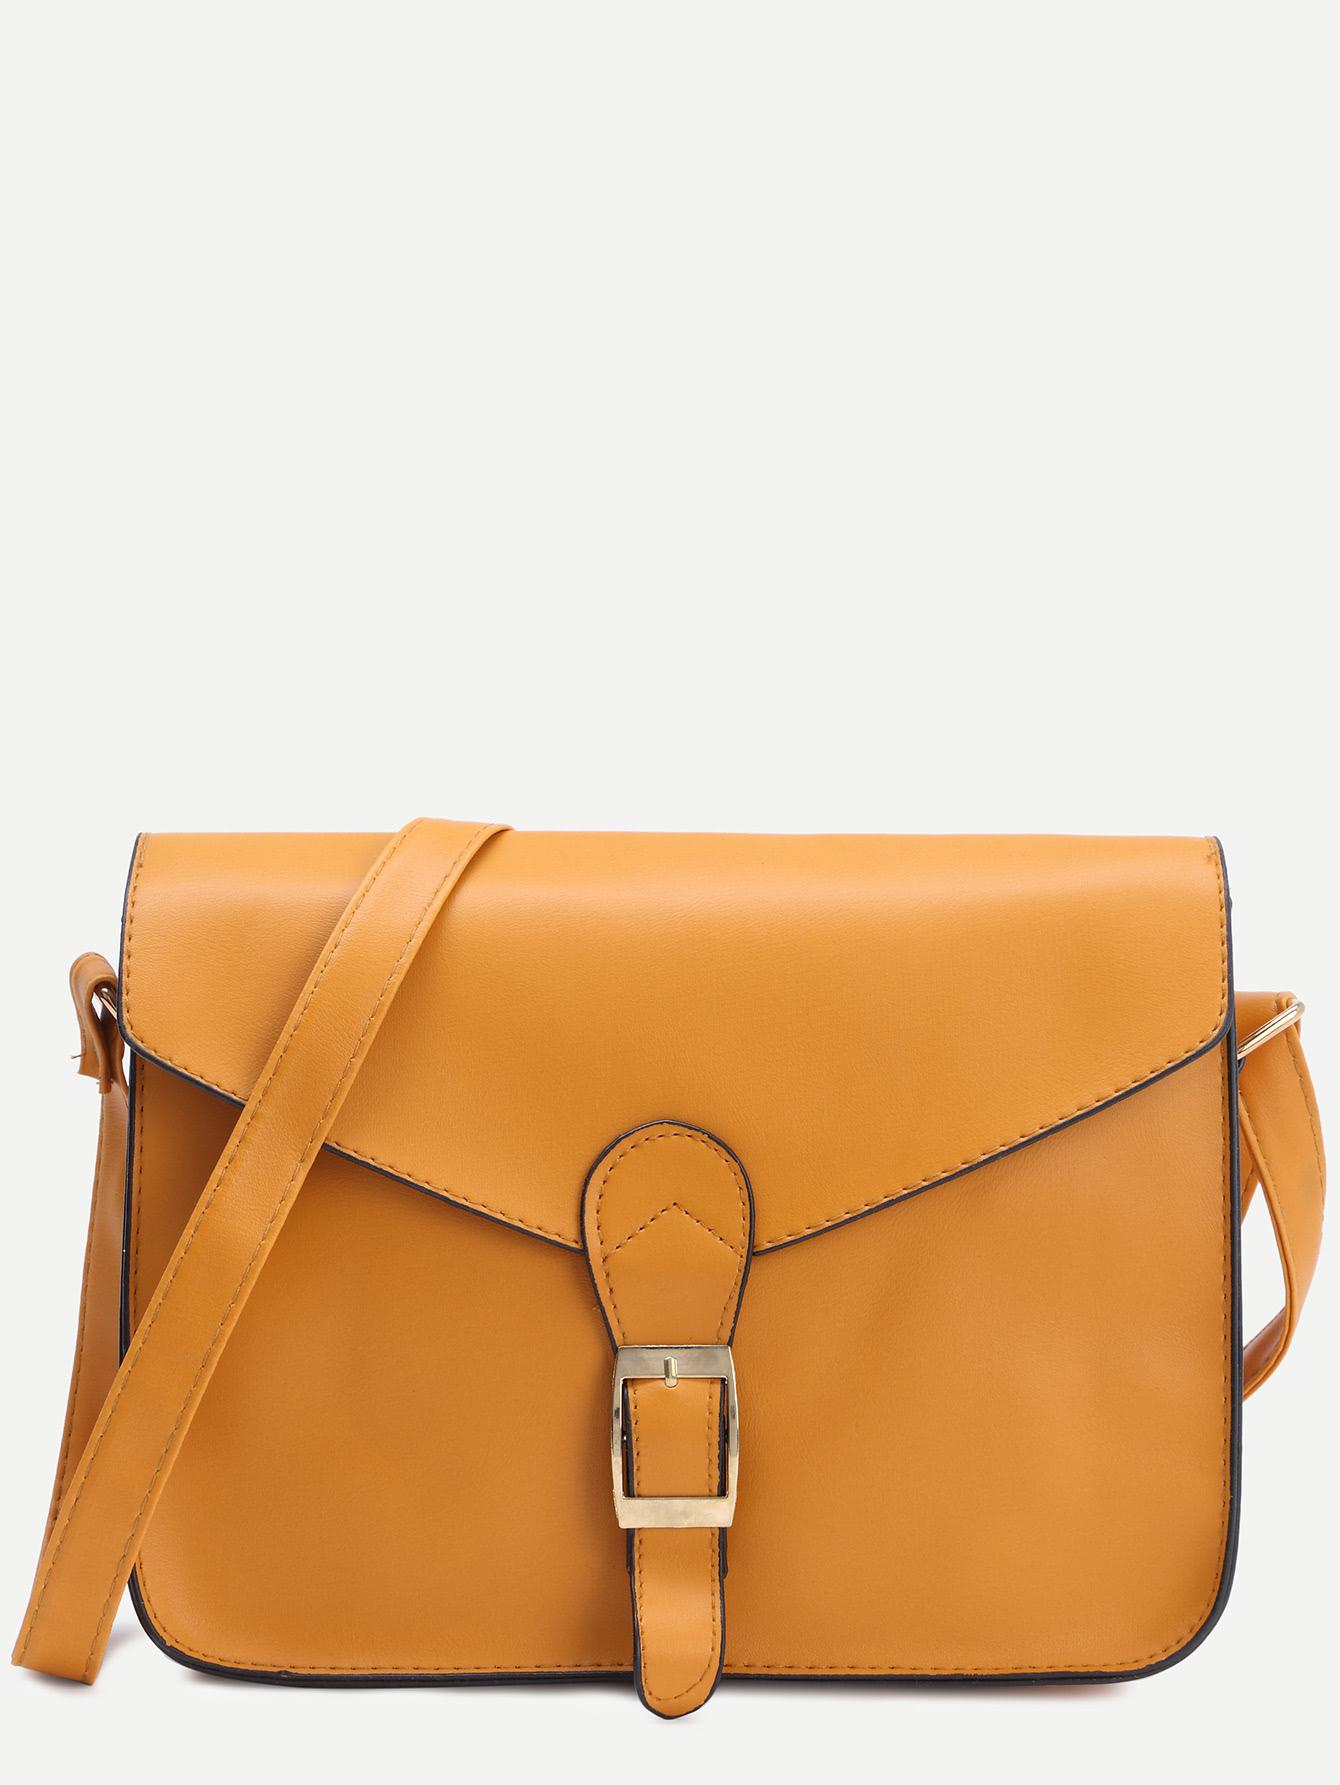 bag160816309_1